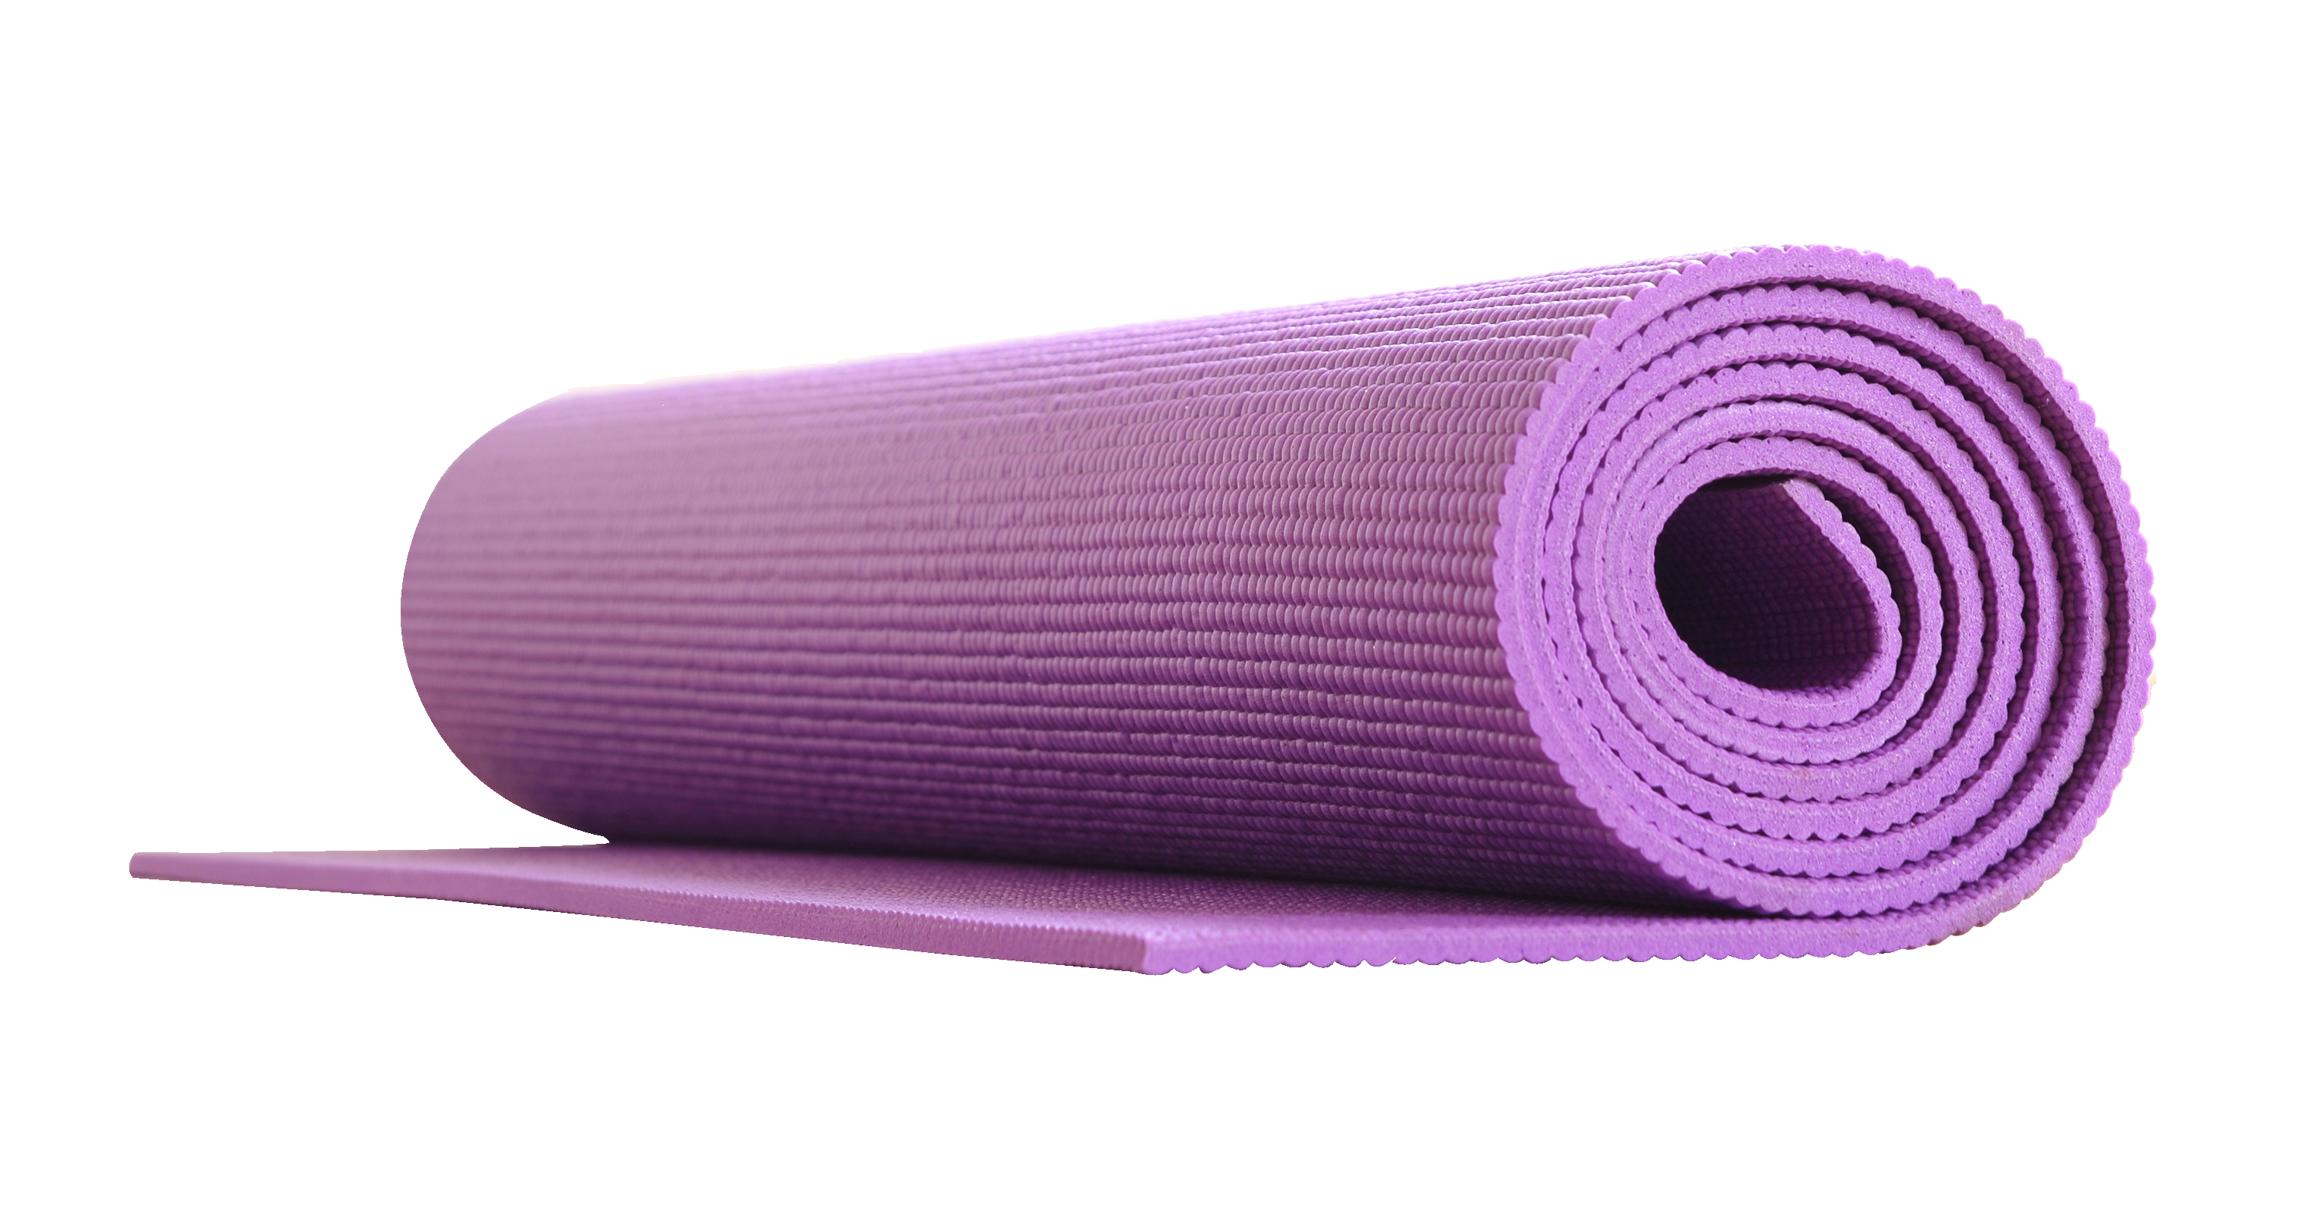 Yoga Mat Png Hdpng.com 2300 - Yoga Mat, Transparent background PNG HD thumbnail